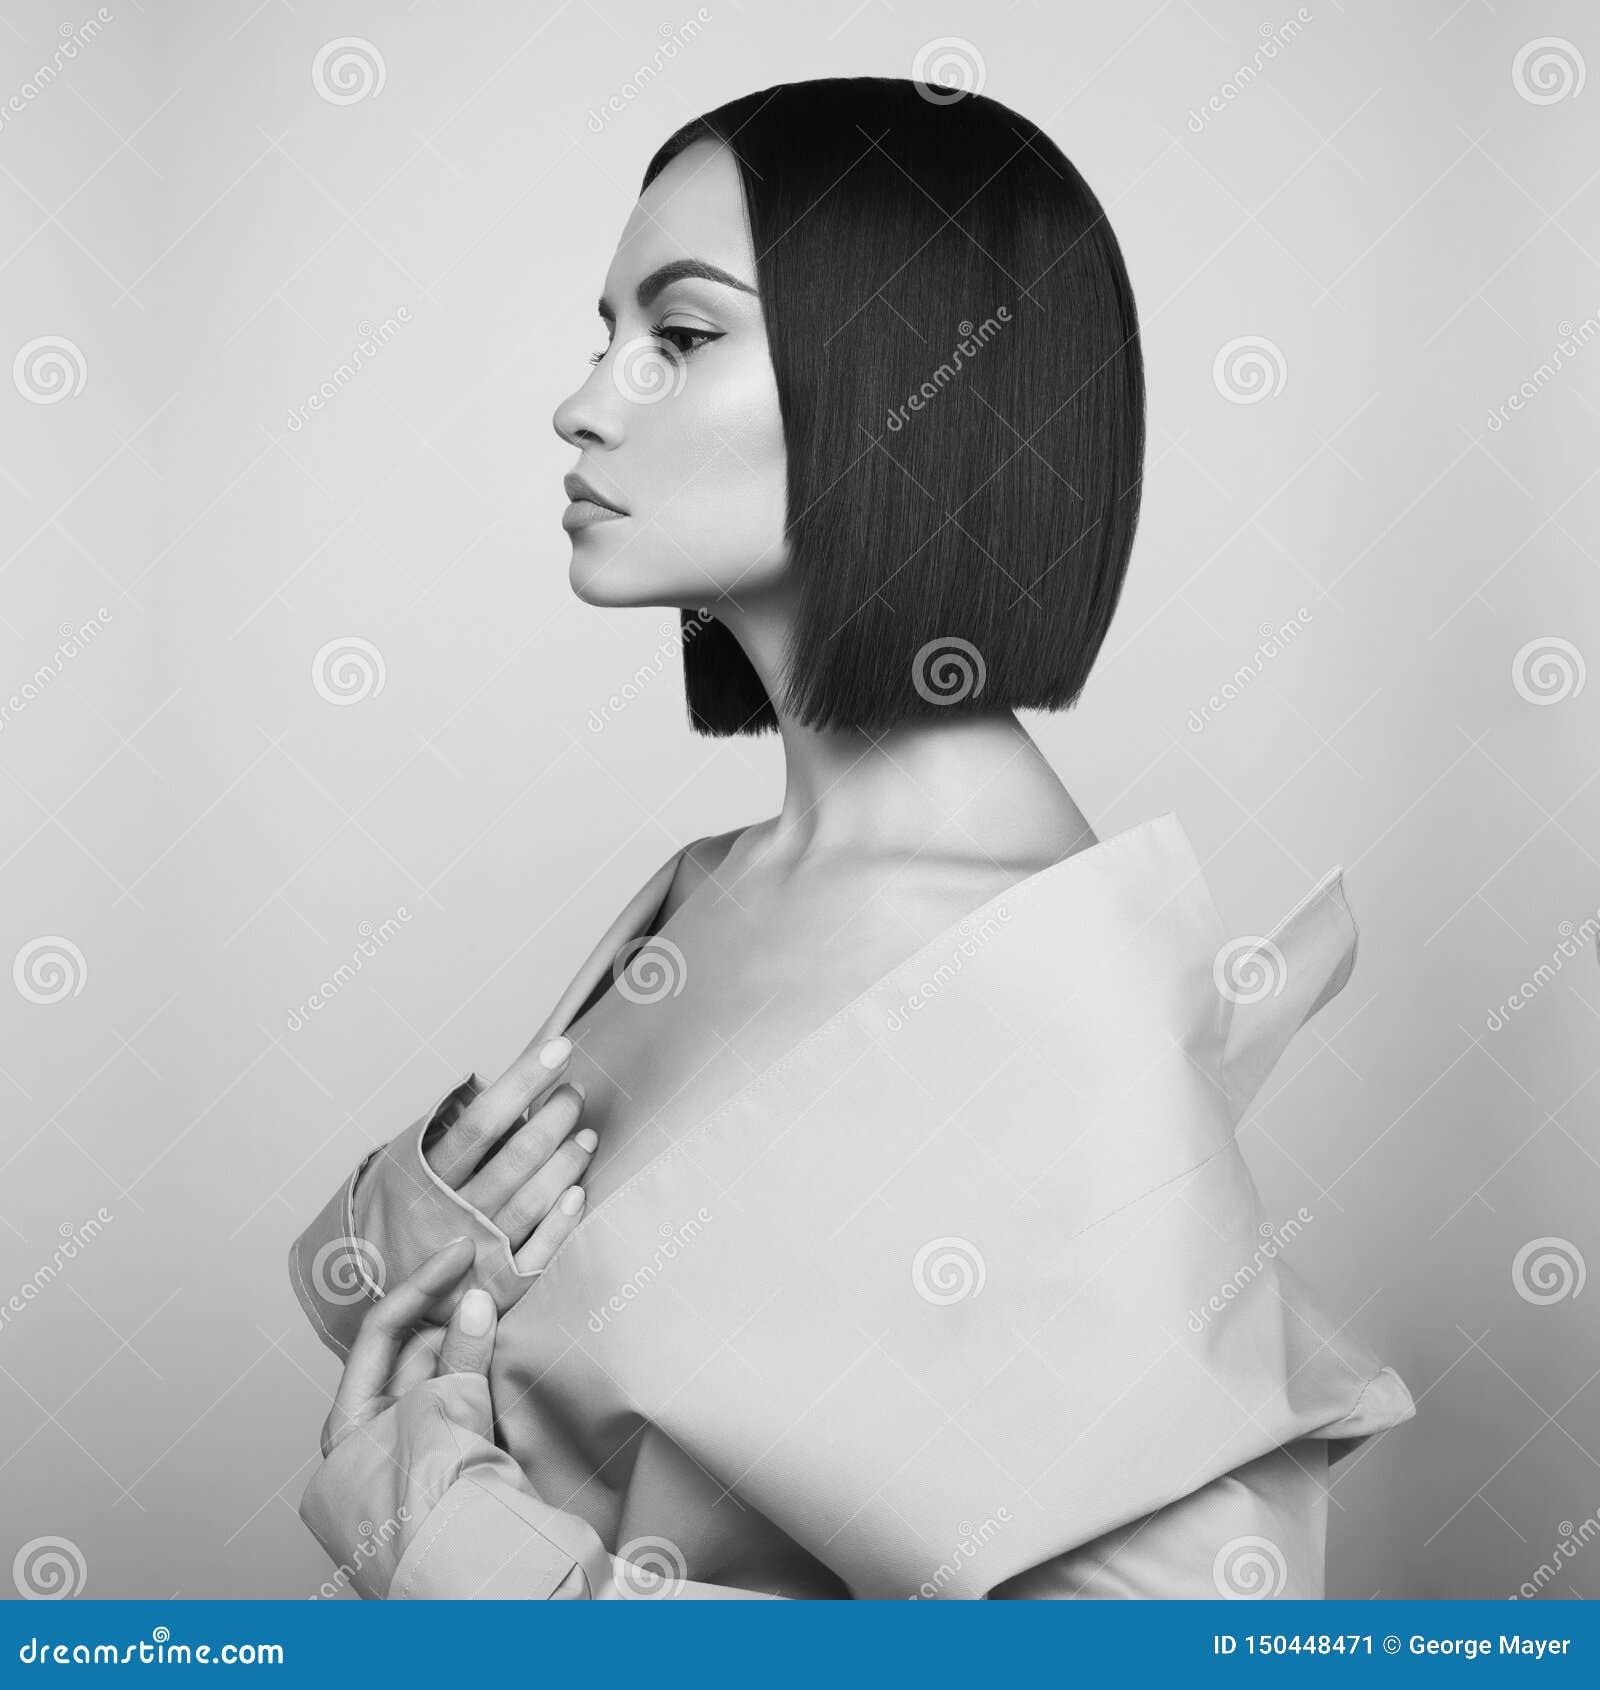 Beautiful woman in white autumn coat. Fashion art portrait